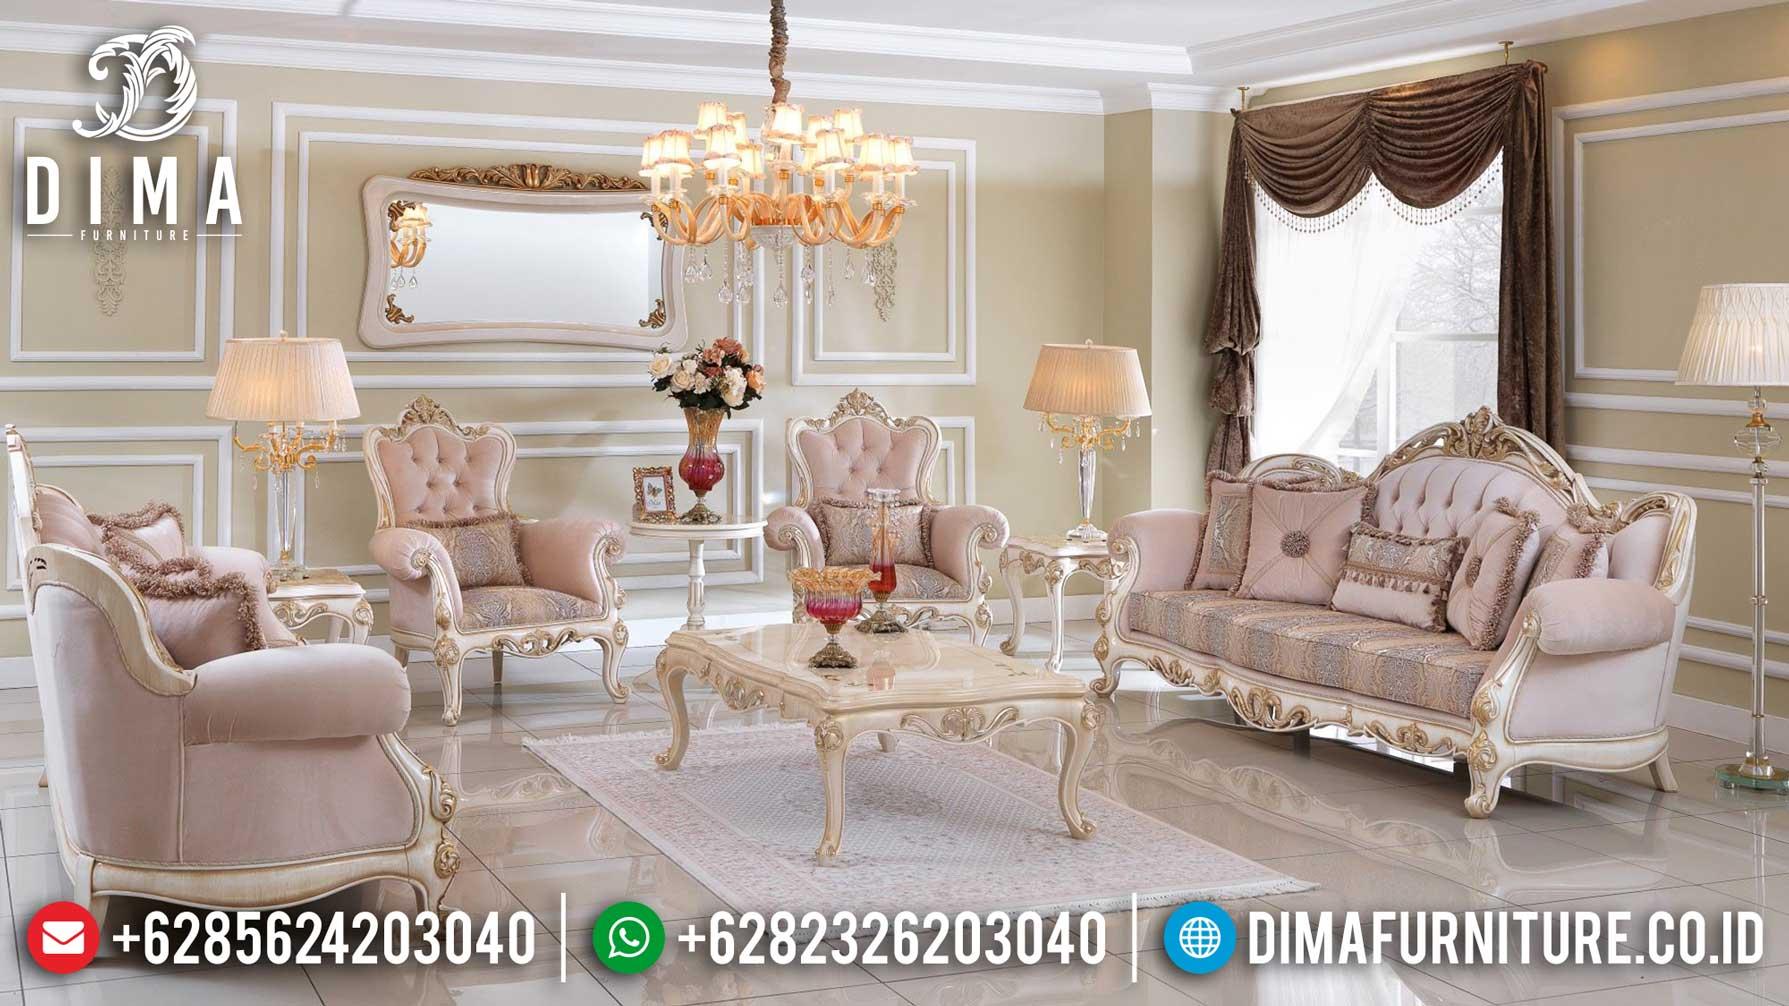 Sofa Tamu Mewah Eve Luxury Classic Ukiran Jepara Design Interior Inspiring TTJ-1233